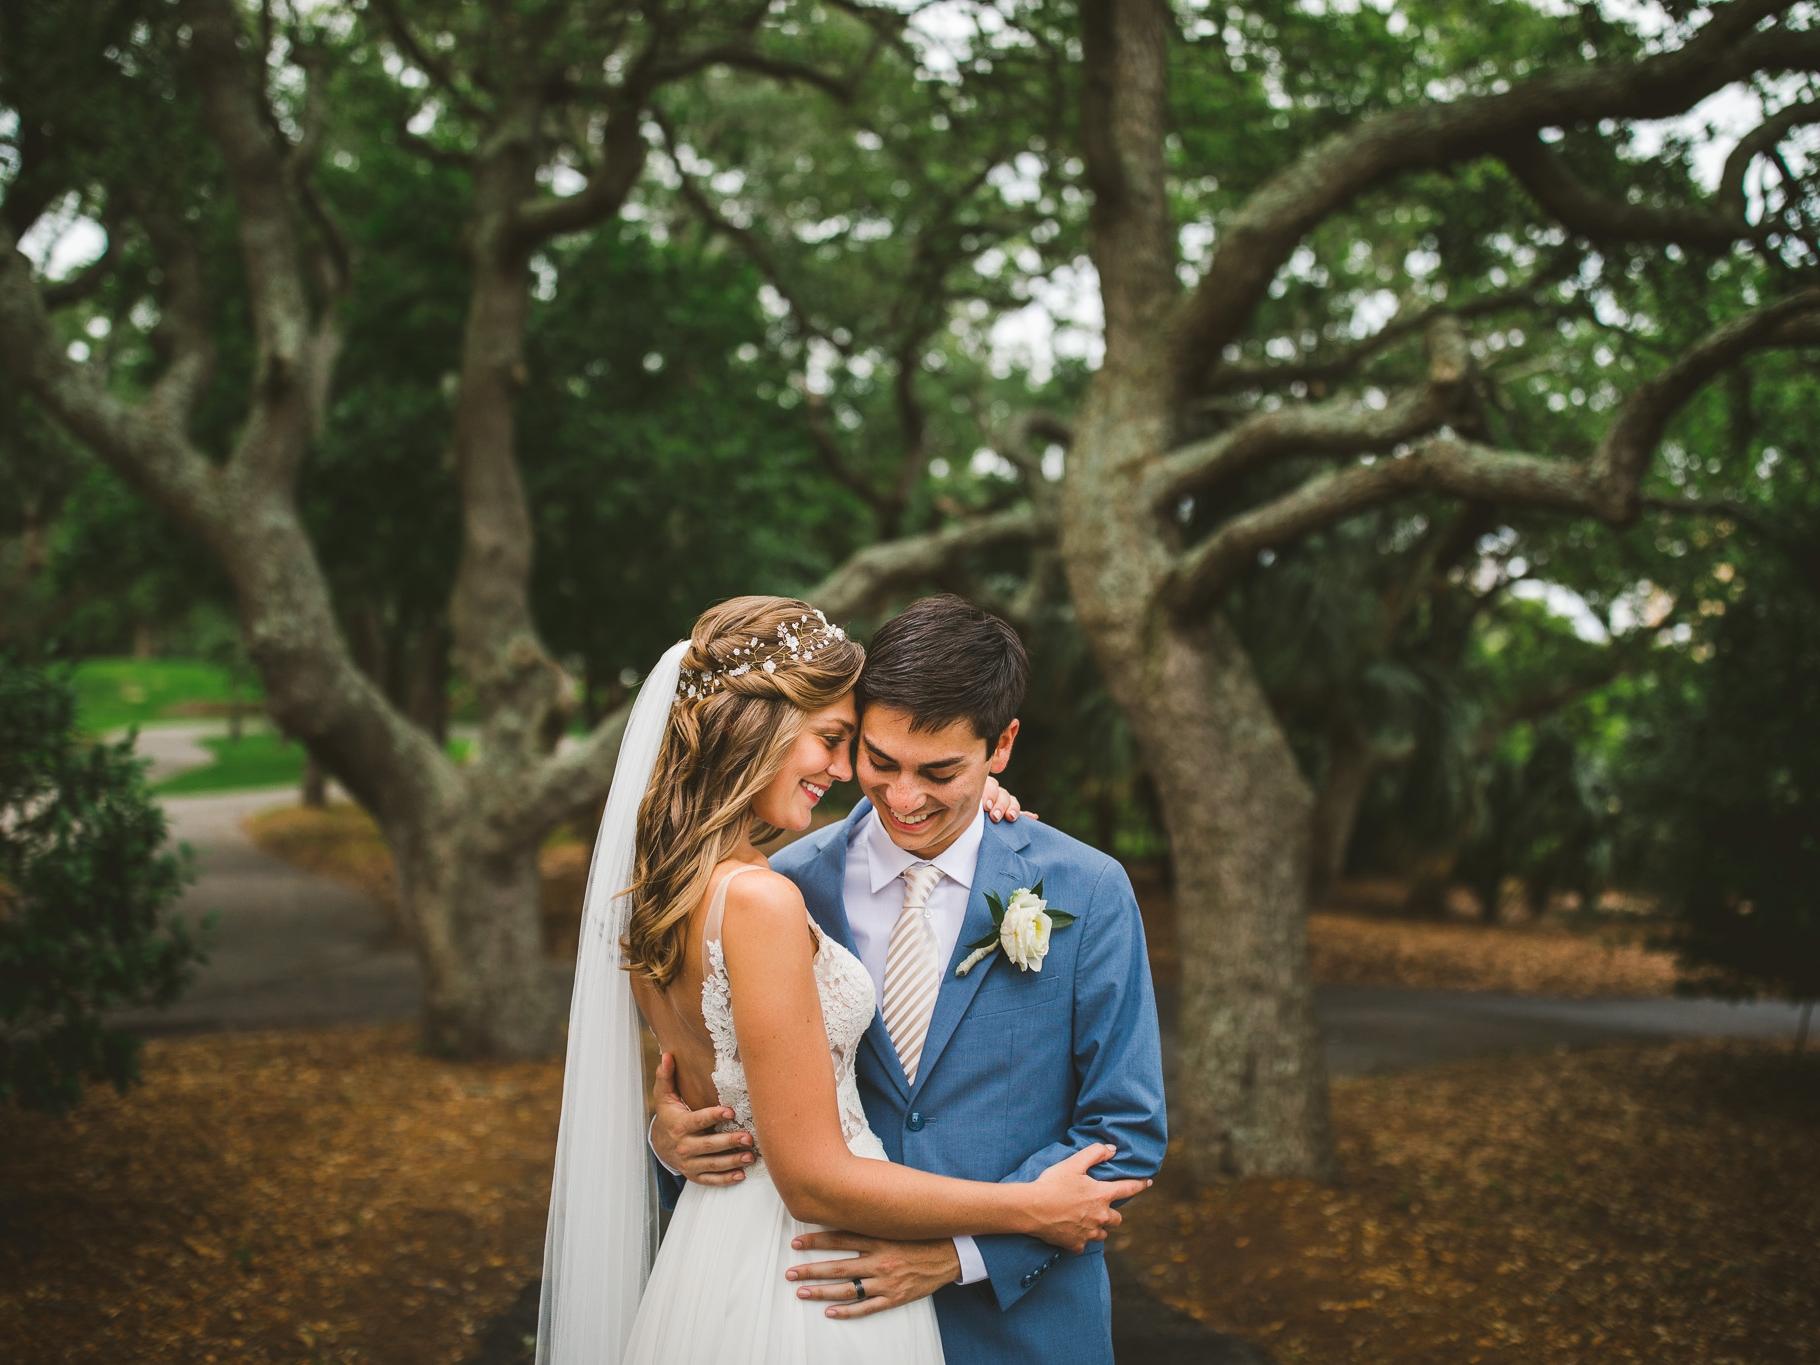 Emily & Julien // Wedding - Dunes Golf and Beach Club Myrtle Beach, SC